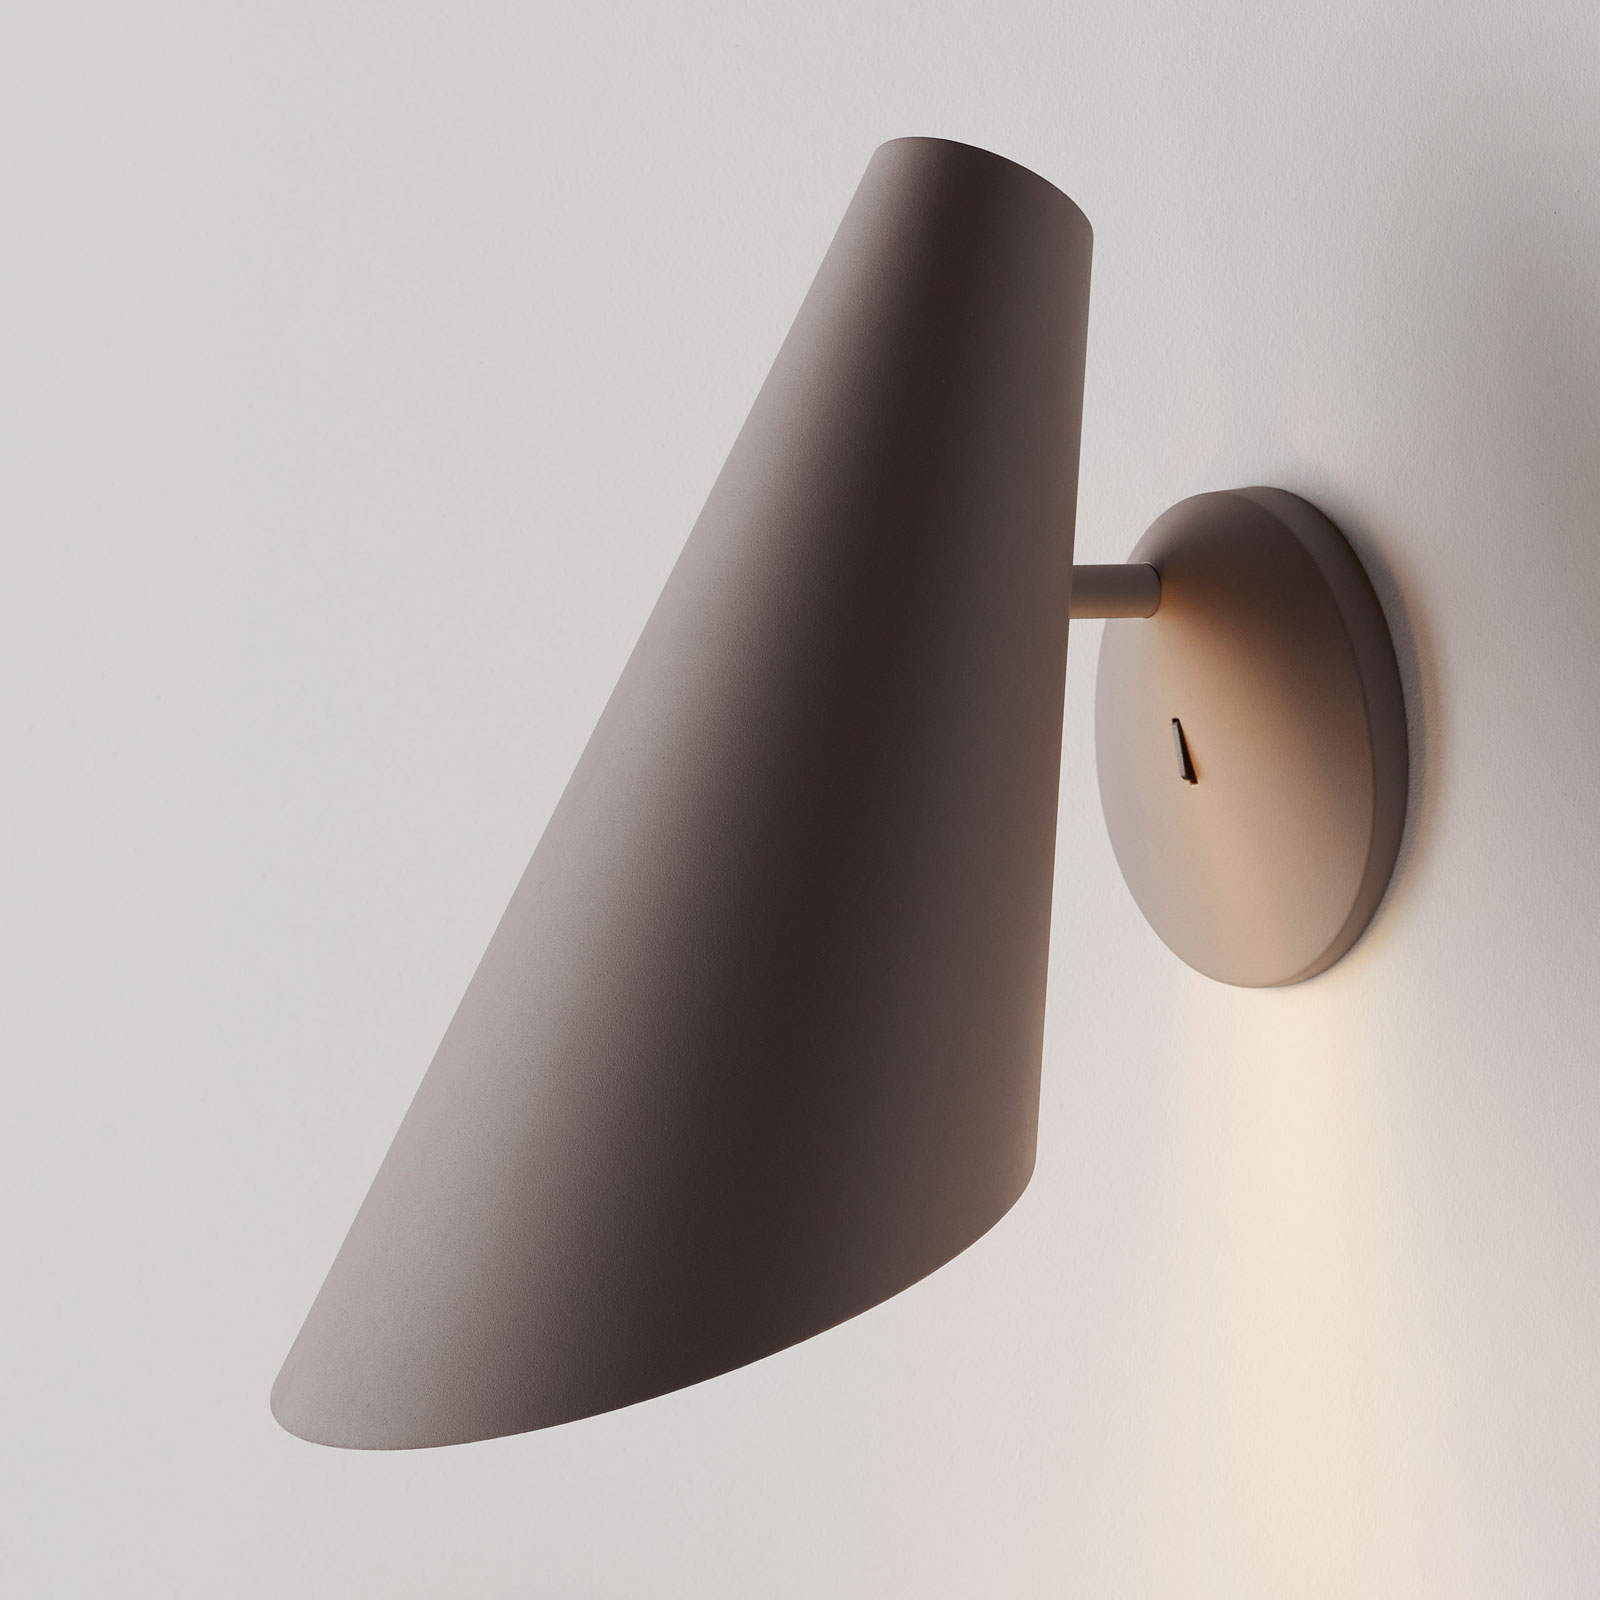 Vibia I.Cono 0720 seinävalaisin, 28 cm, beige